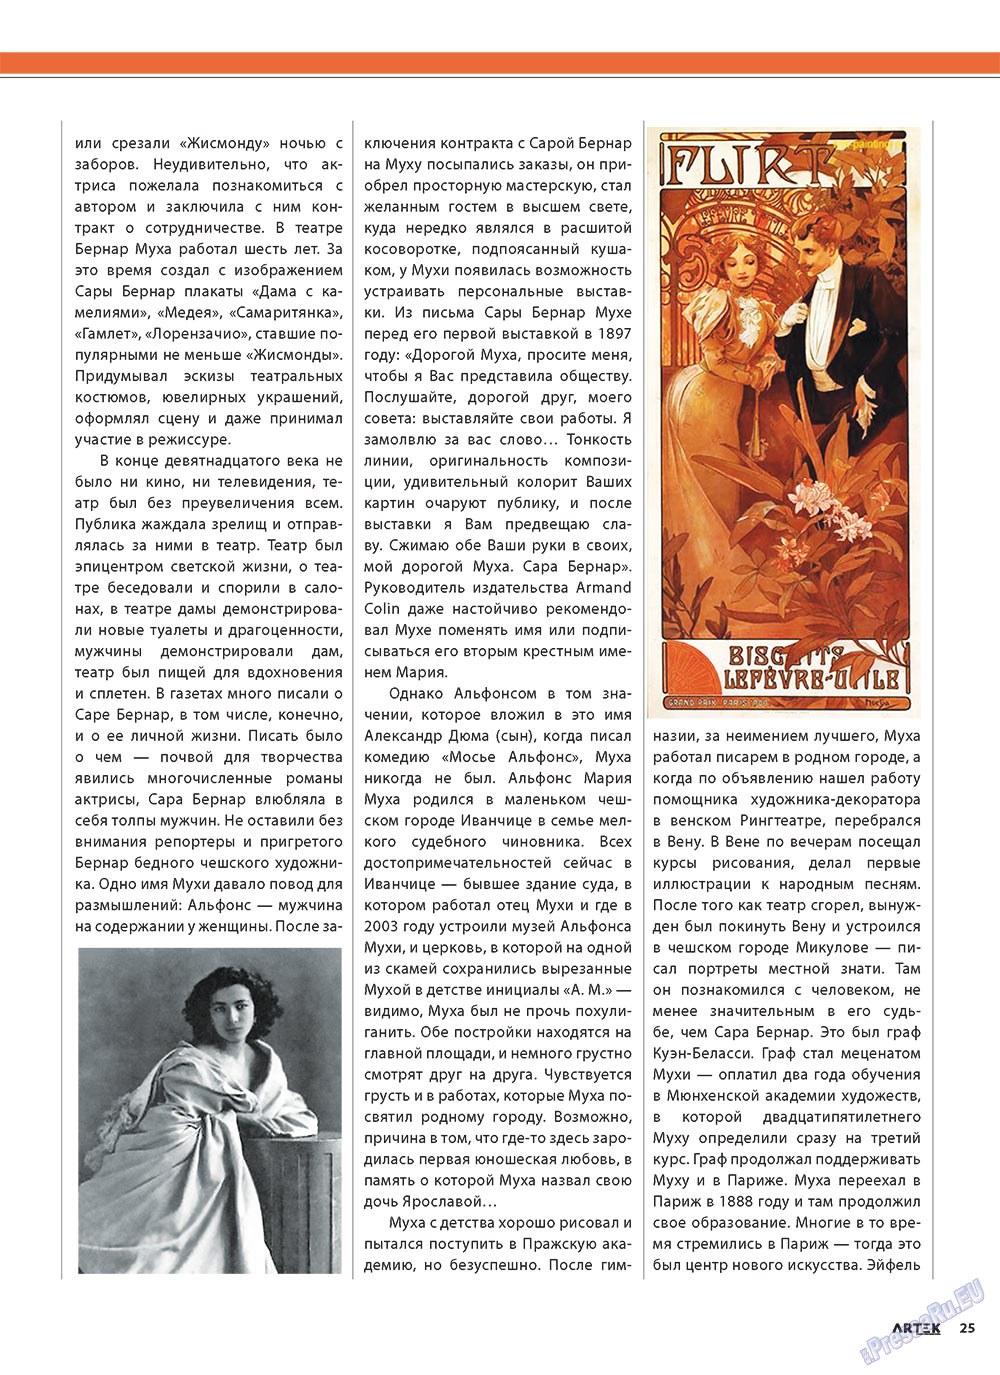 Артек (журнал). 2010 год, номер 6, стр. 27